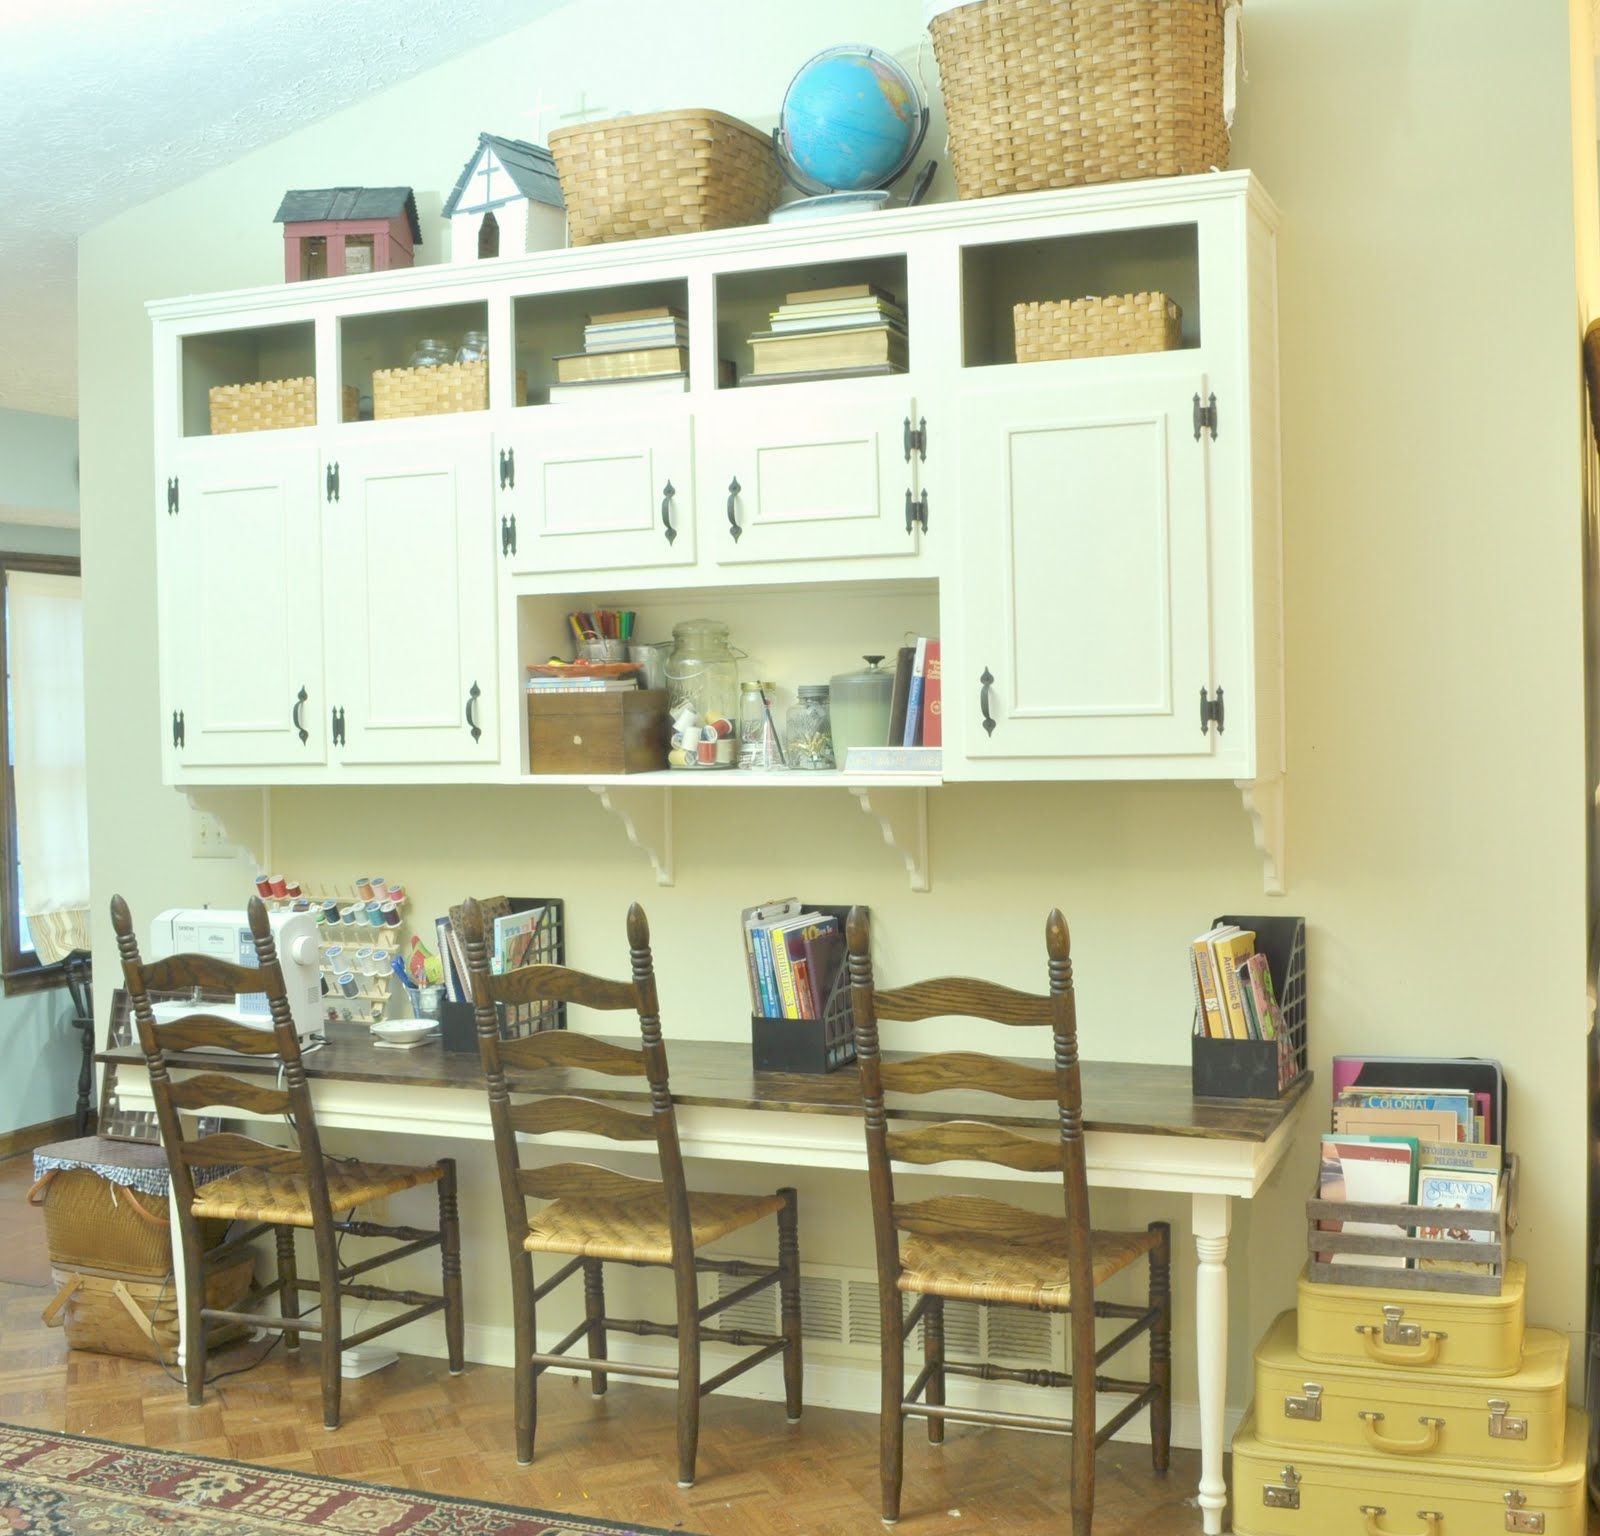 Teen homeschool rooms google search craft room ideas for Homeschool dining room ideas